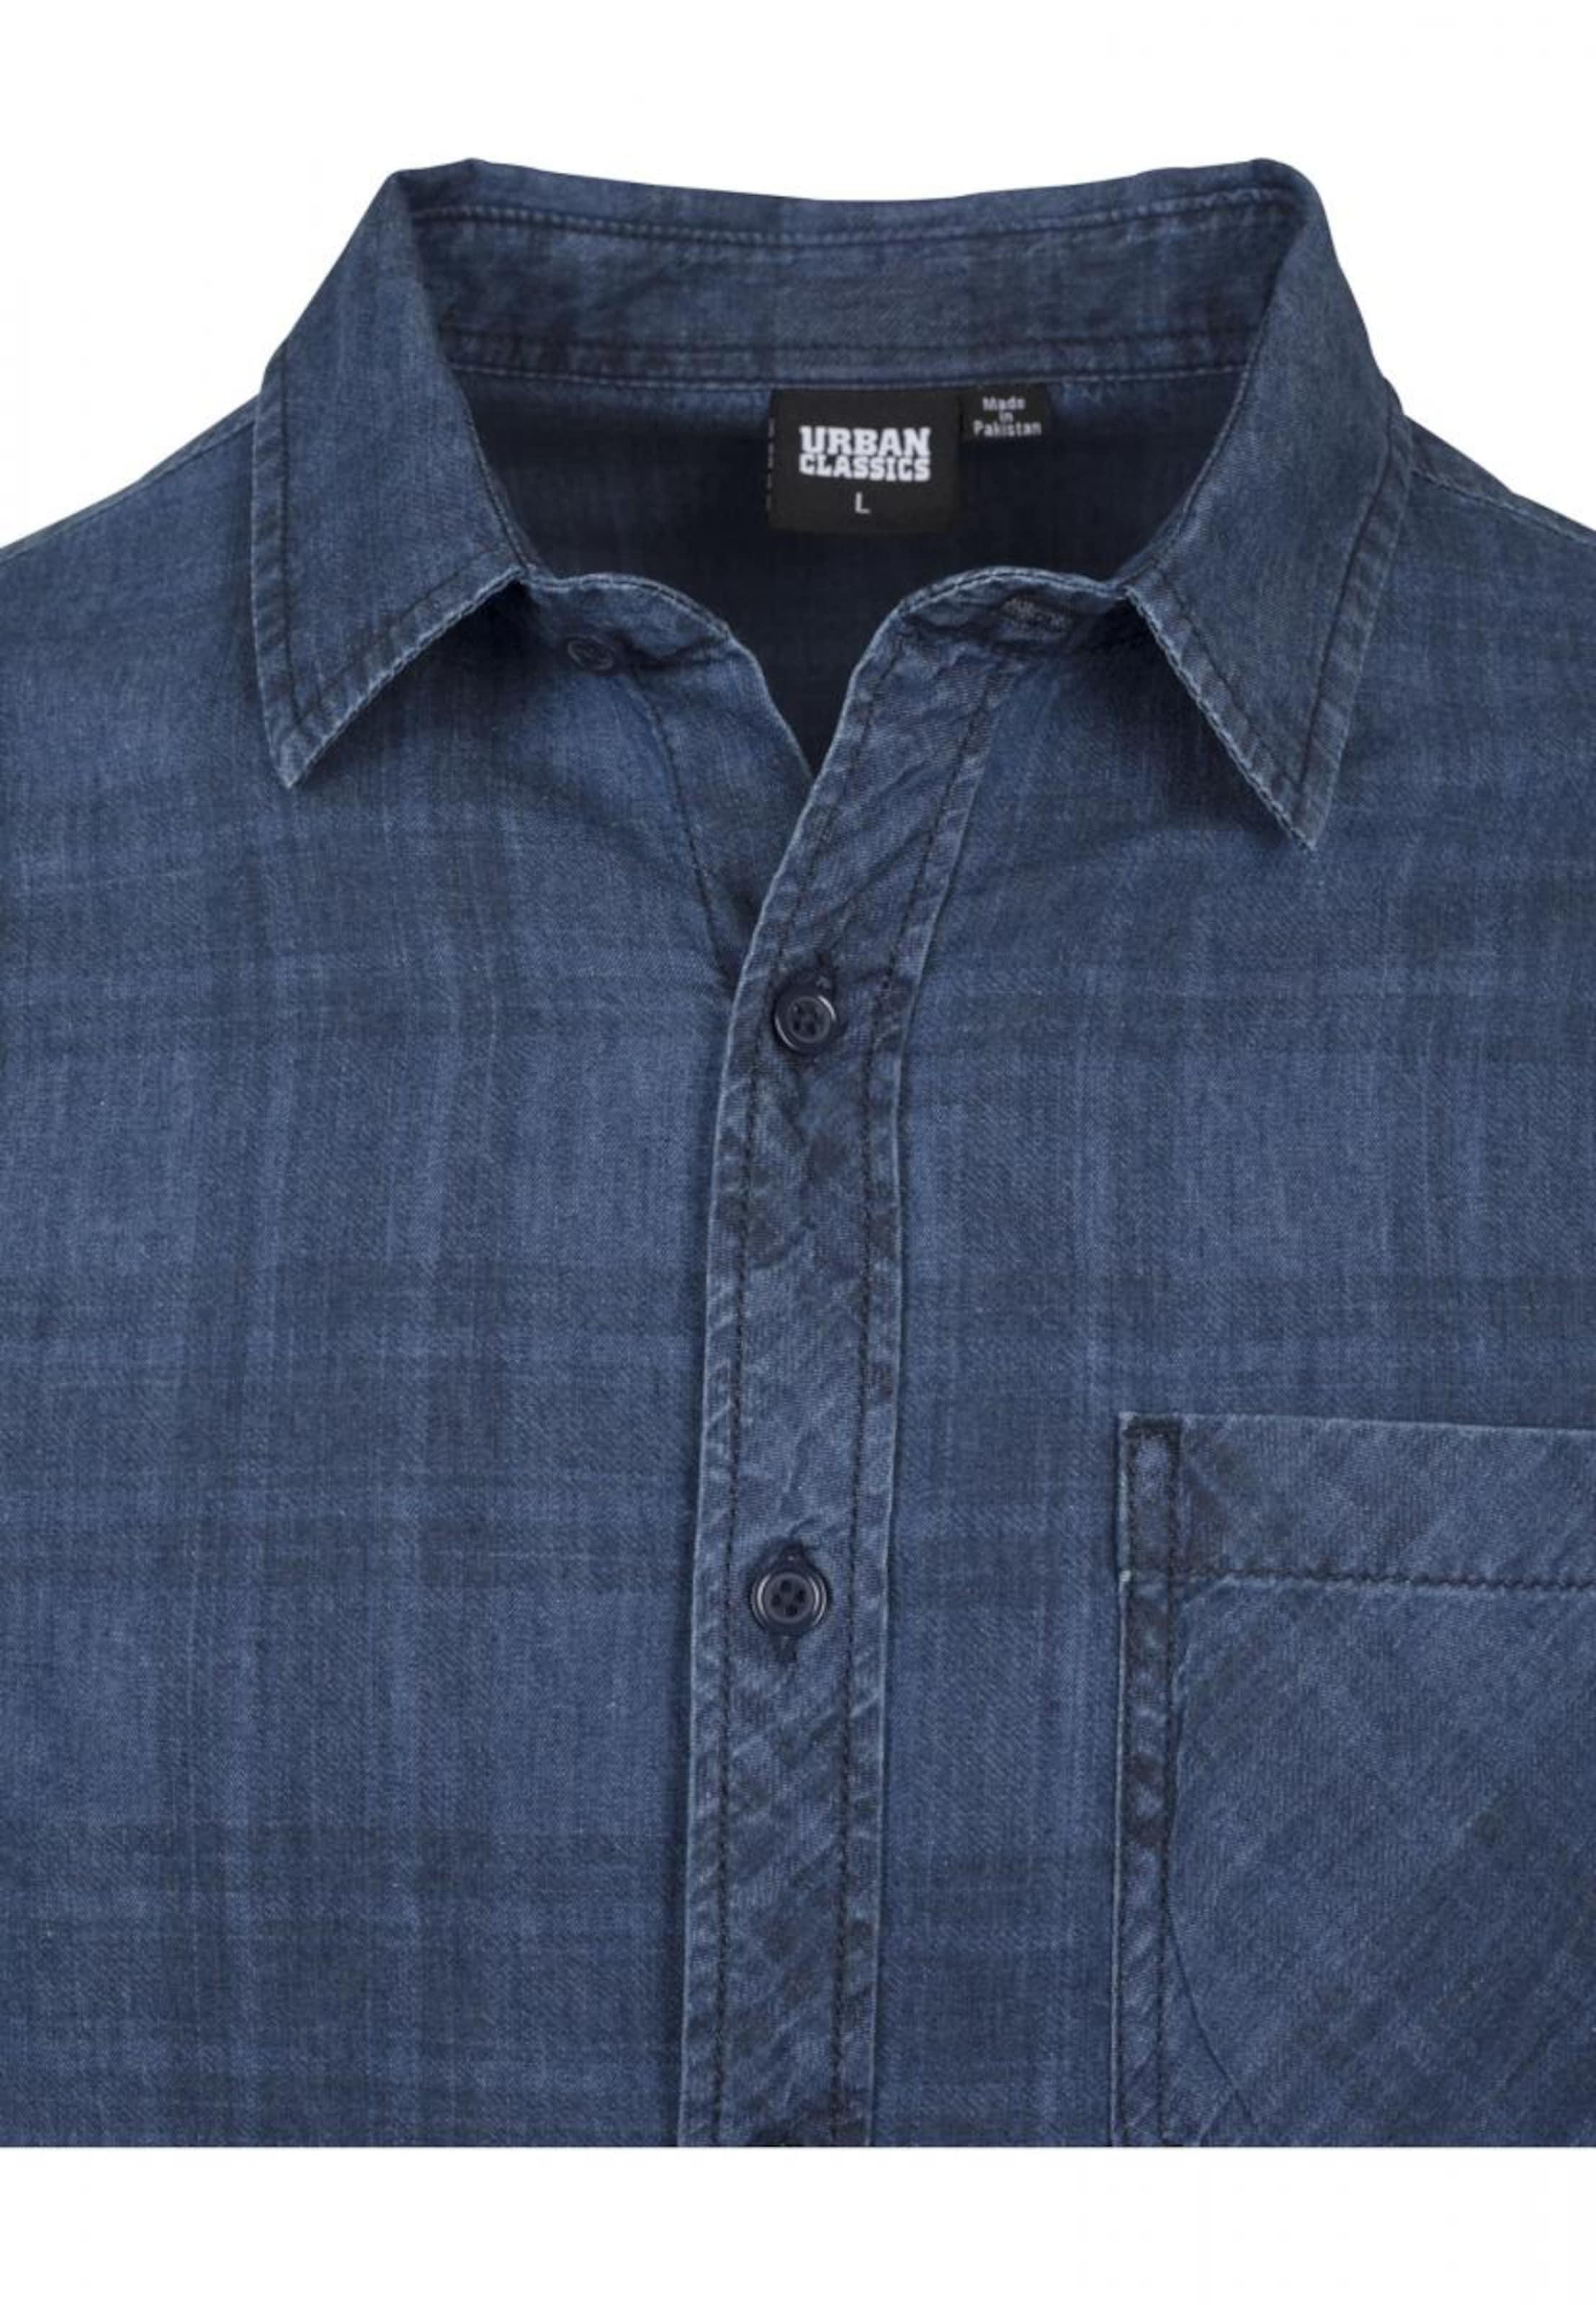 'check' Classics Blue In Shirt Urban Denim O80wnkXP